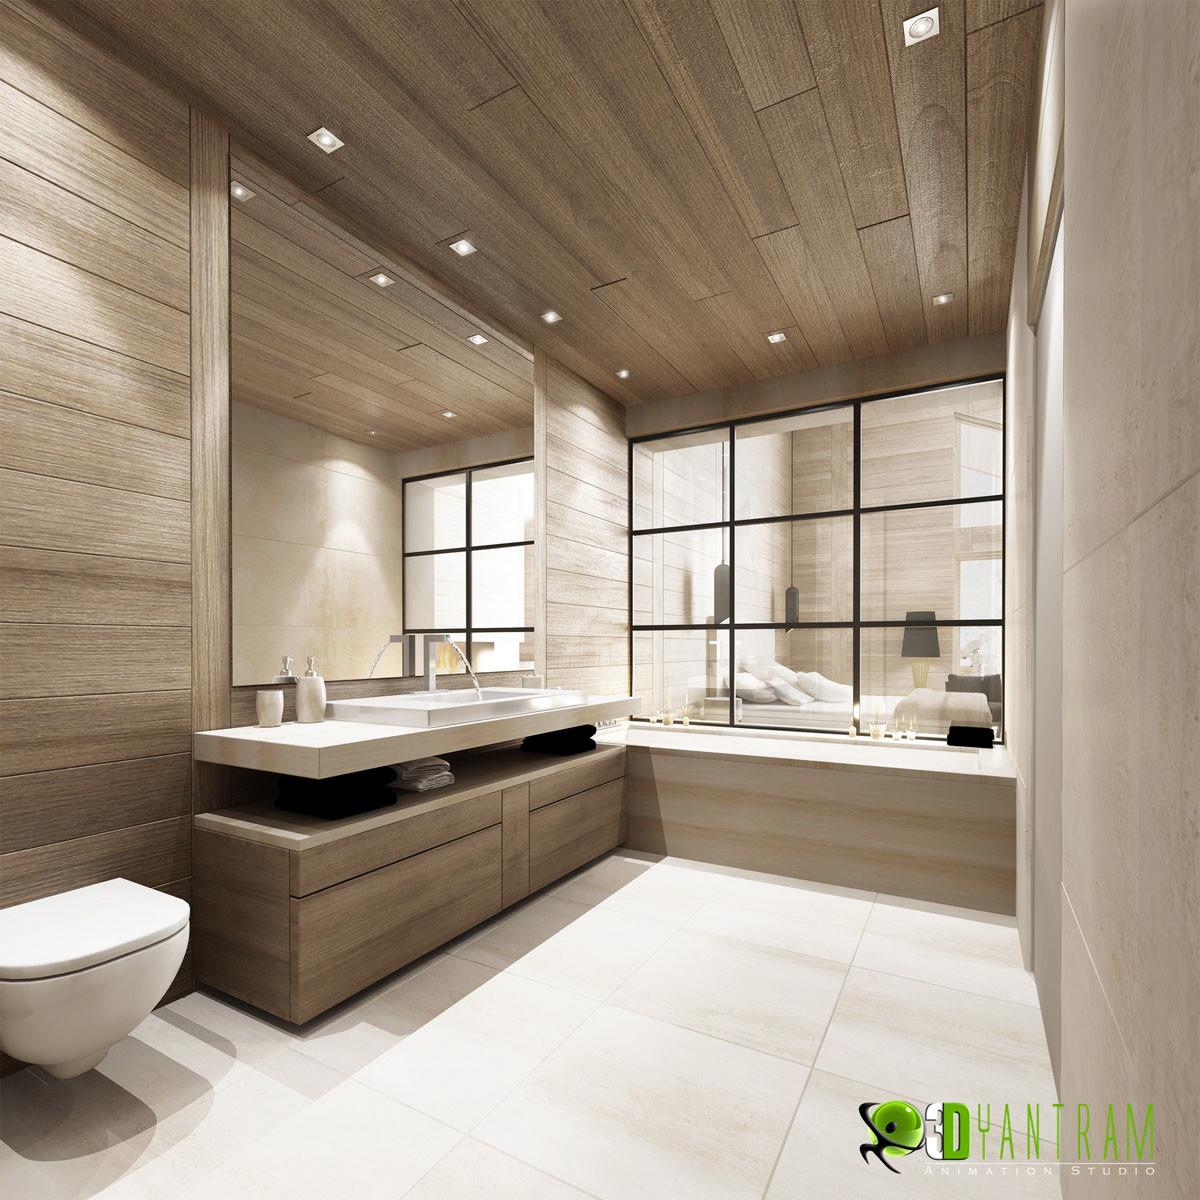 Yantram Studio Modern 3d Bathroom Interior Design Canada